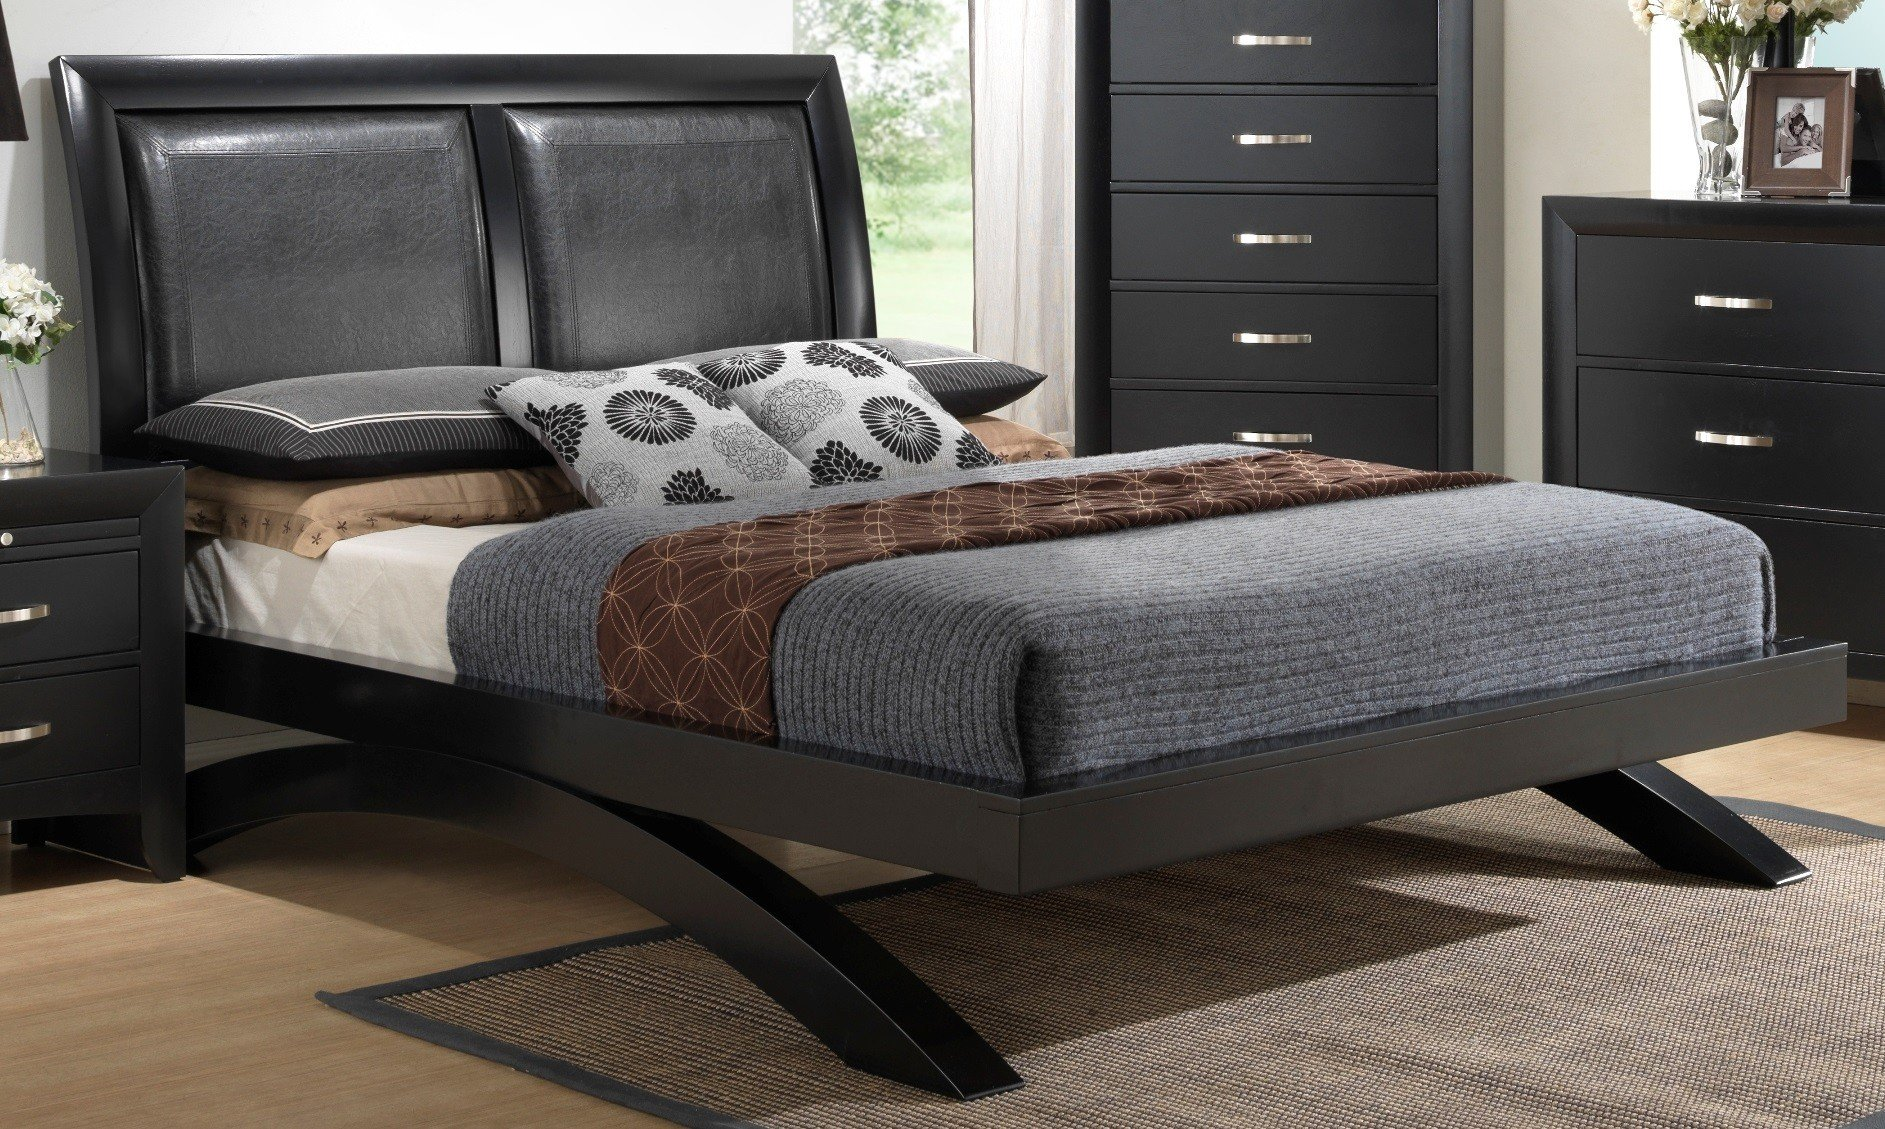 Crown Mark Furniture Galinda Arch Bedroom Set In Black